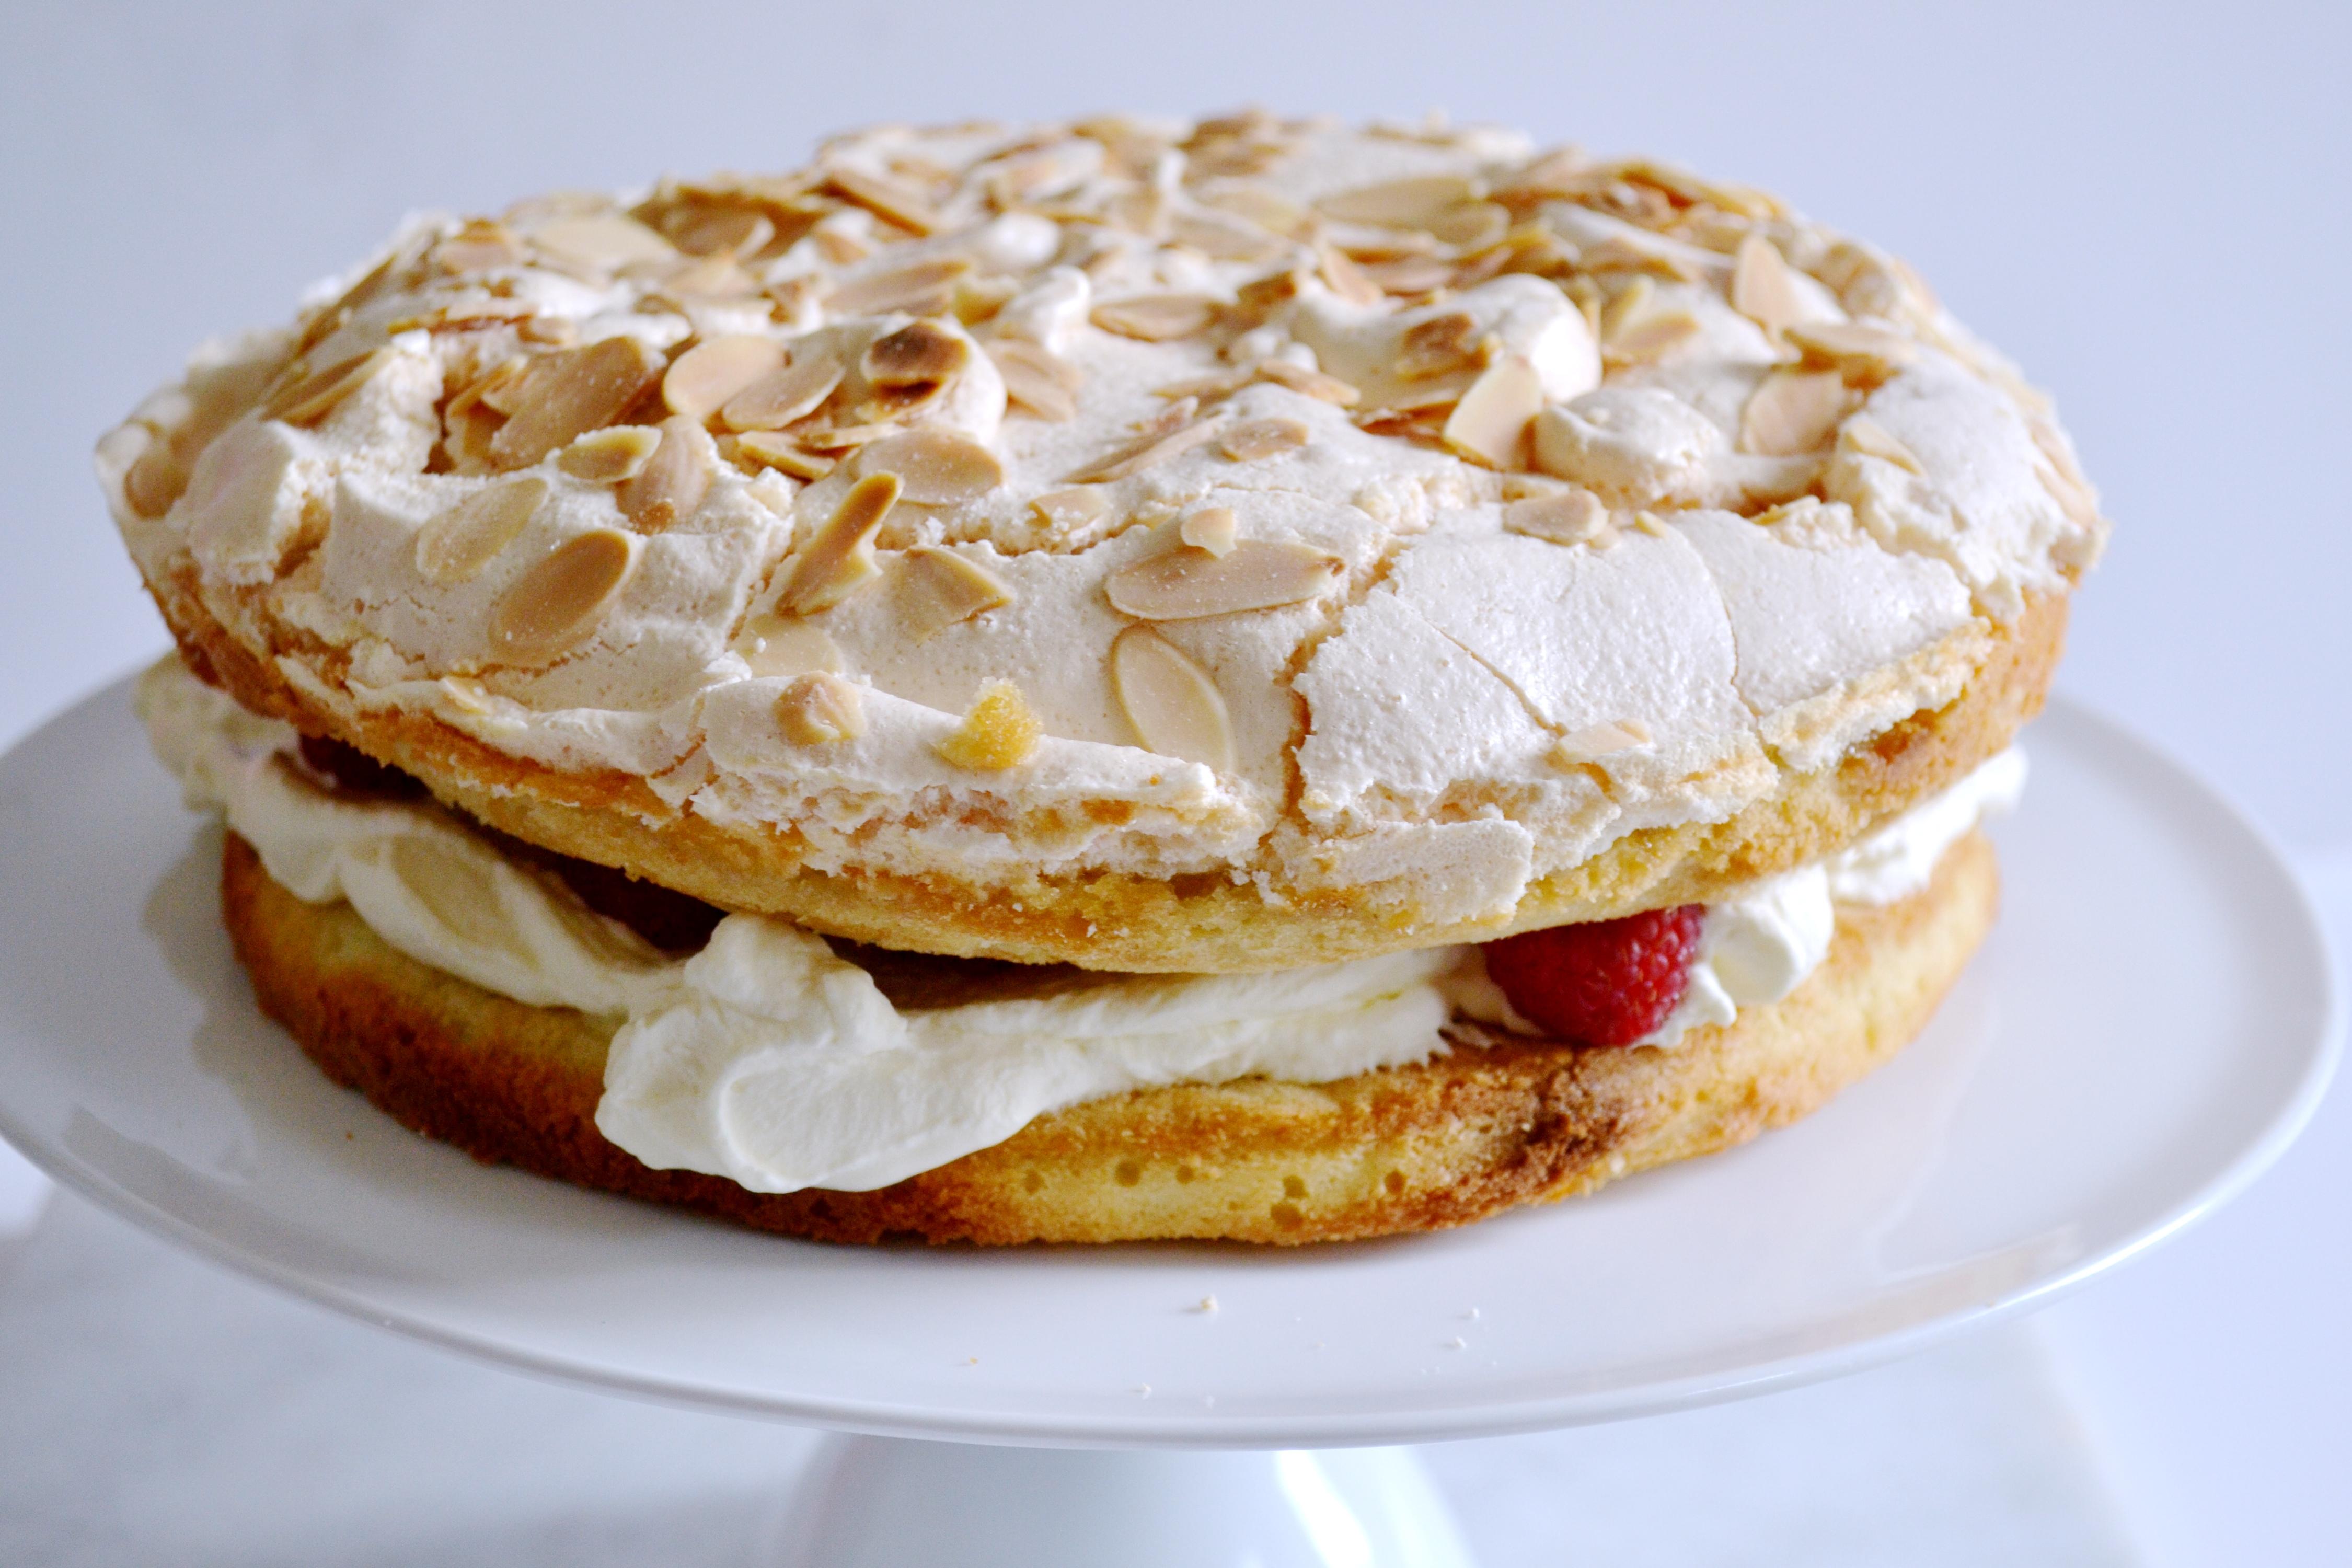 Raspberry & Almond Meringue Cake